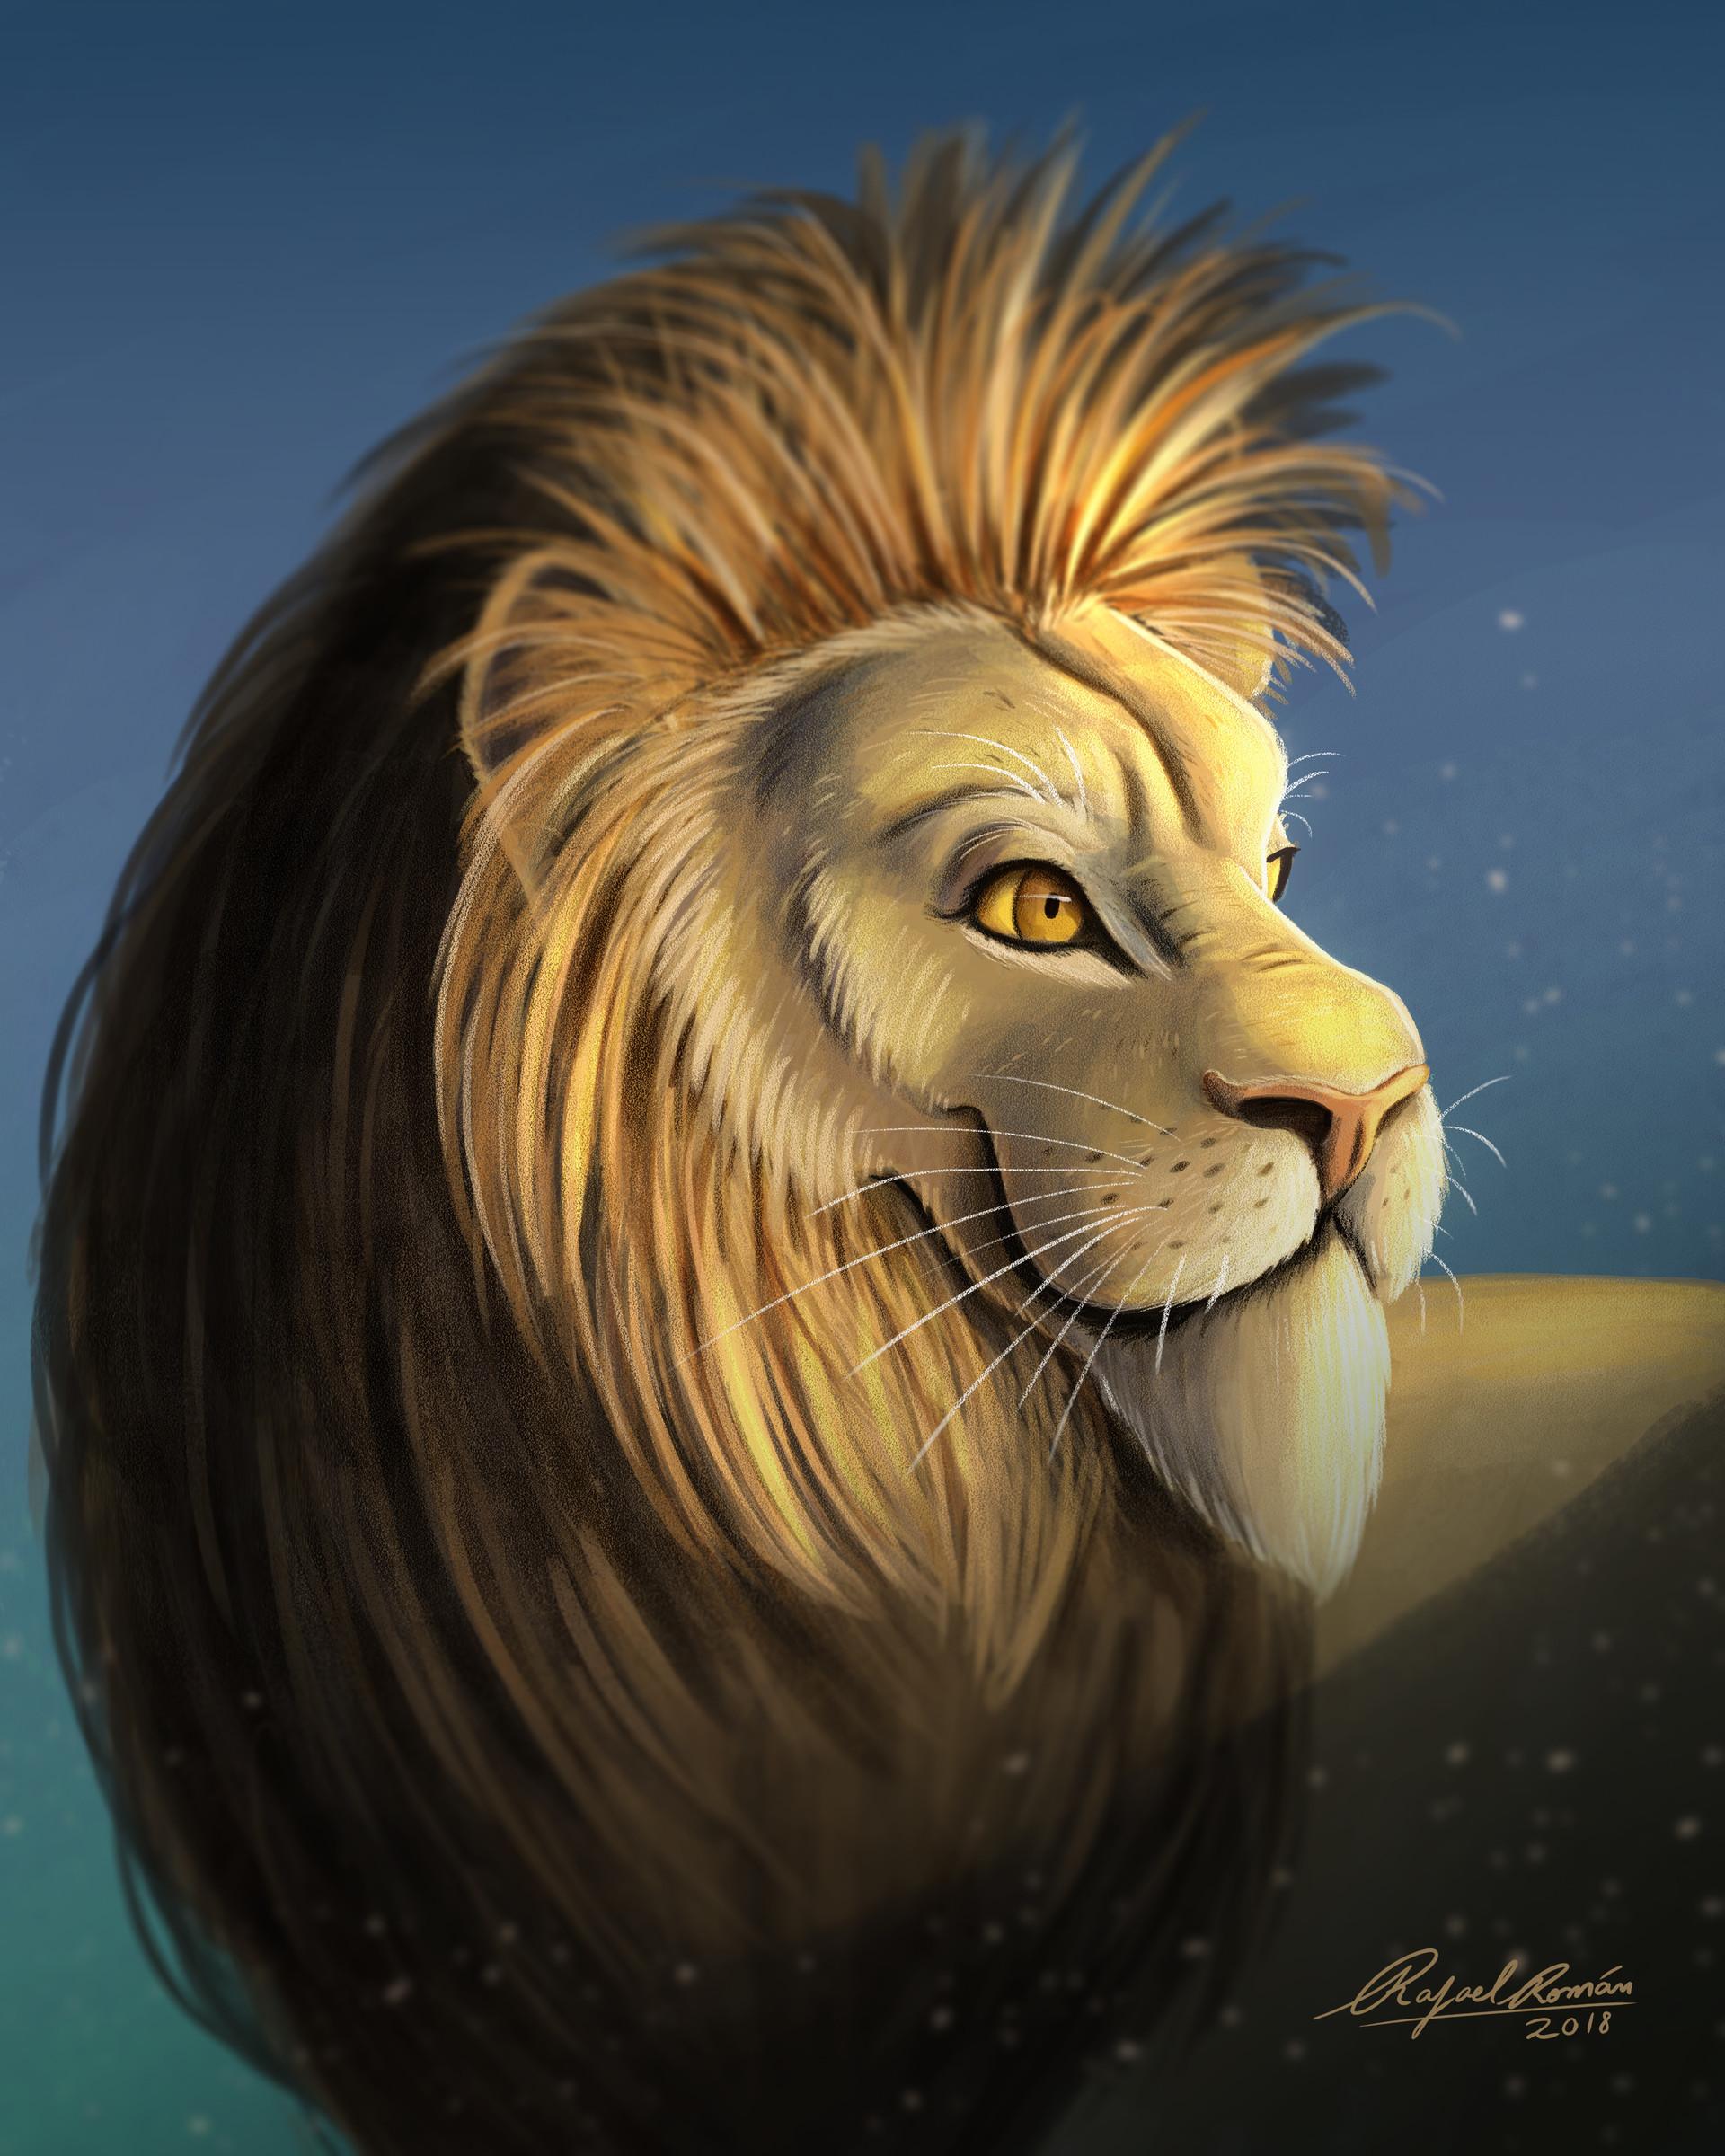 Rafael andrade lion illustration